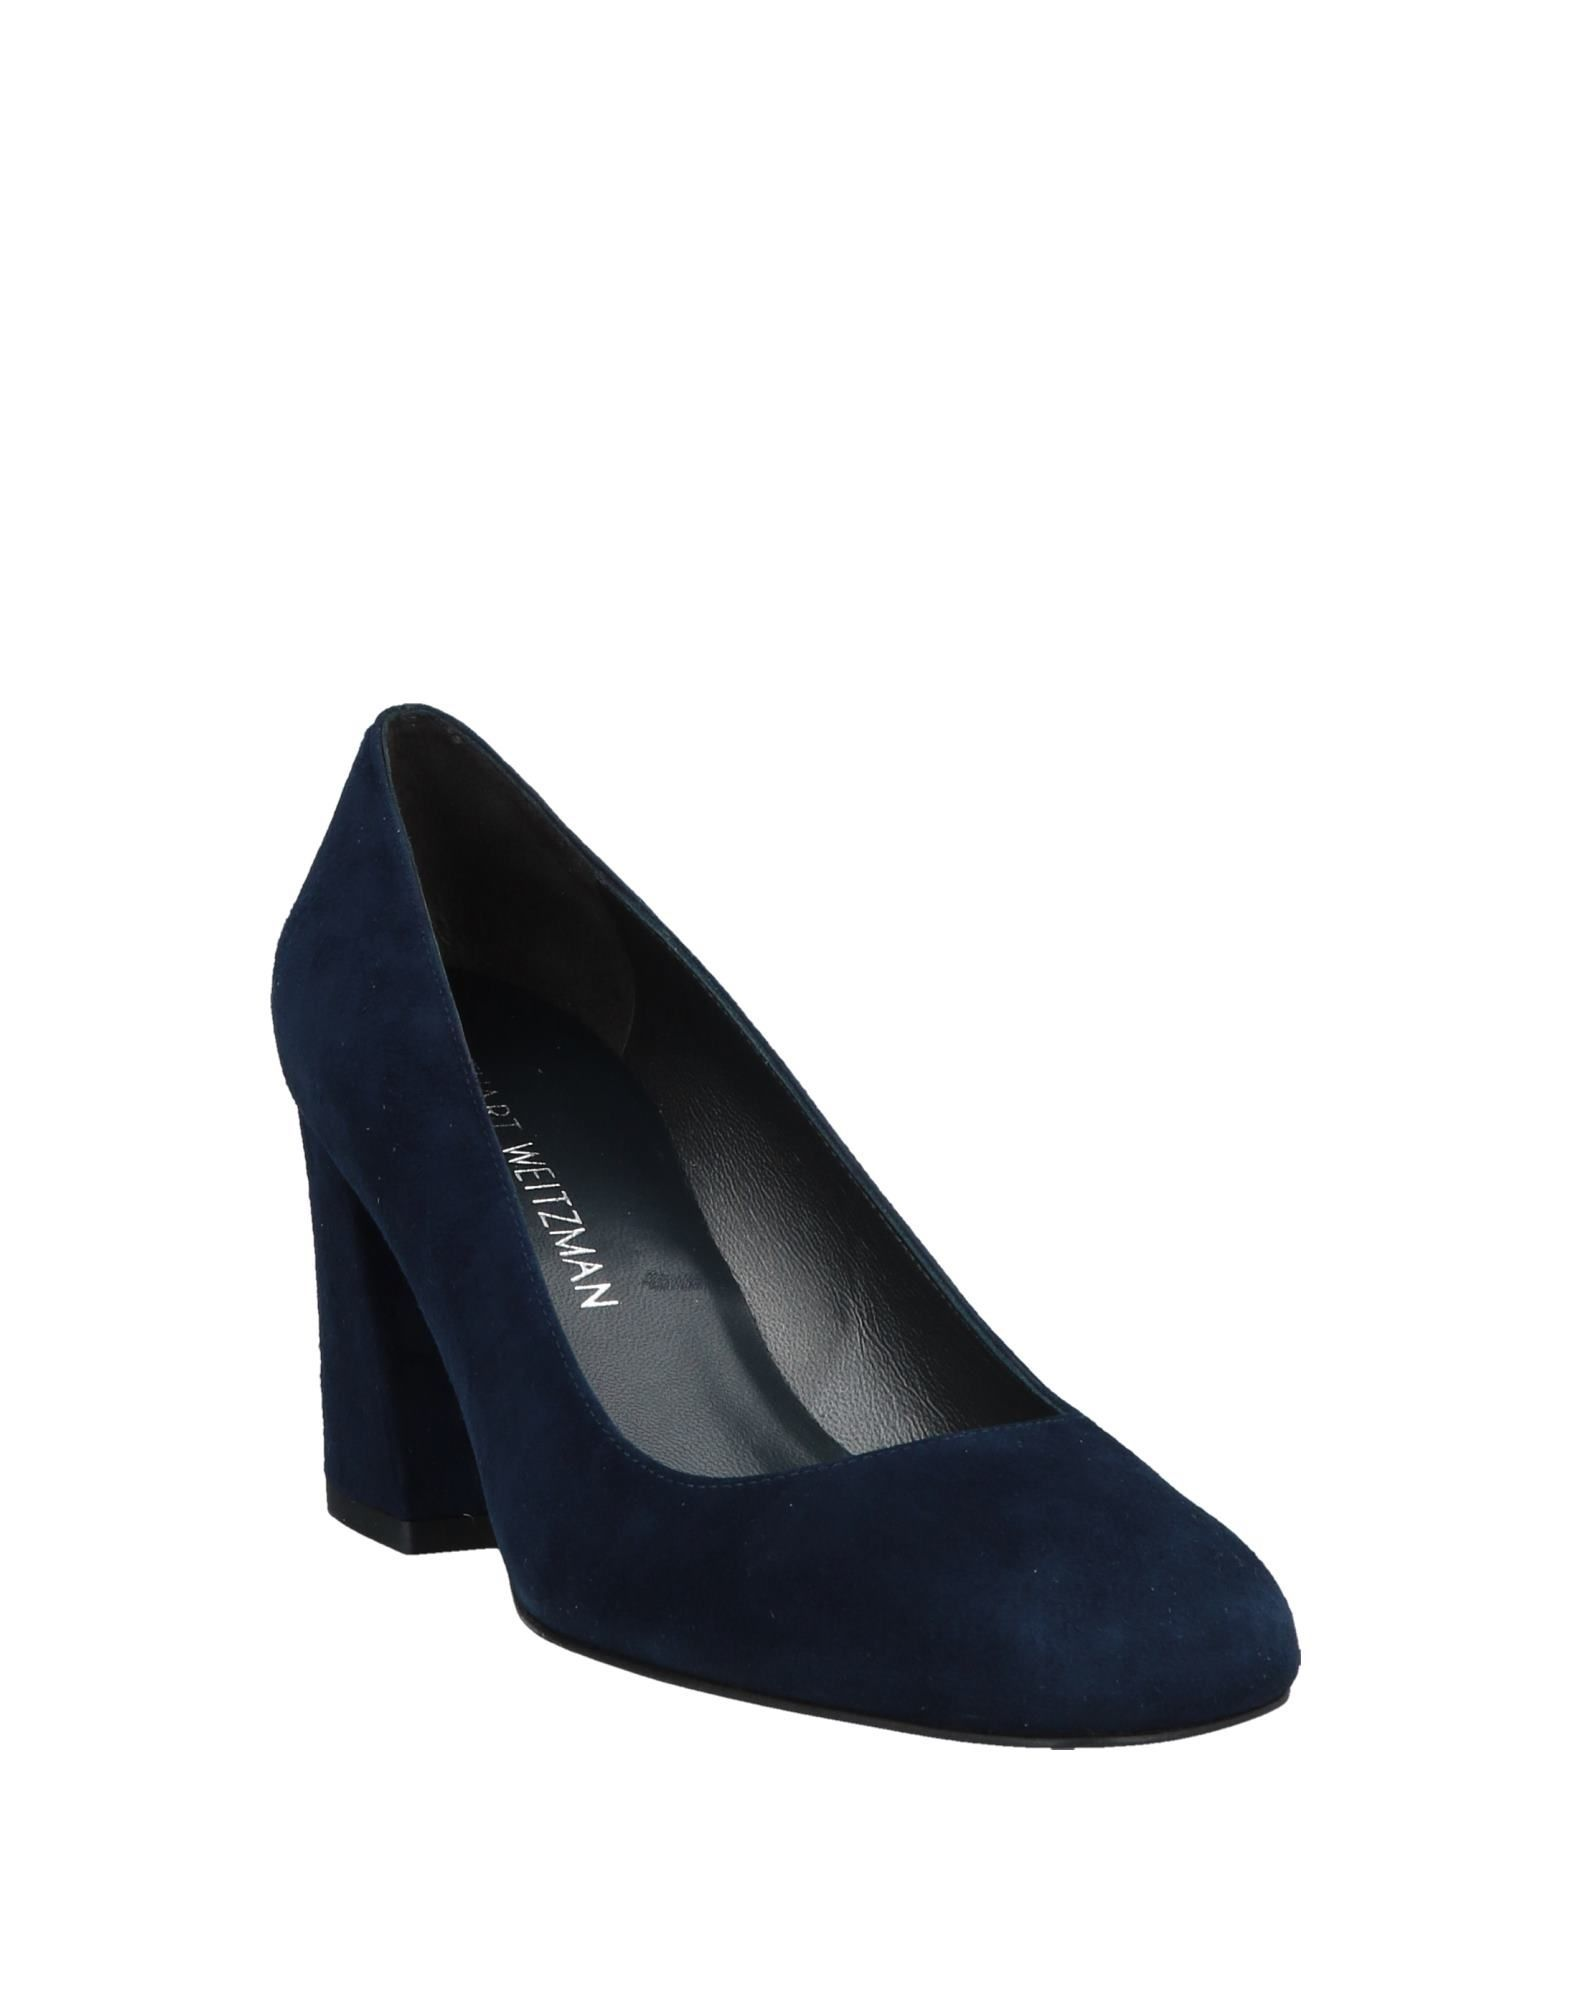 Stuart Weitzman Dark Blue Leather Court Shoe Heels